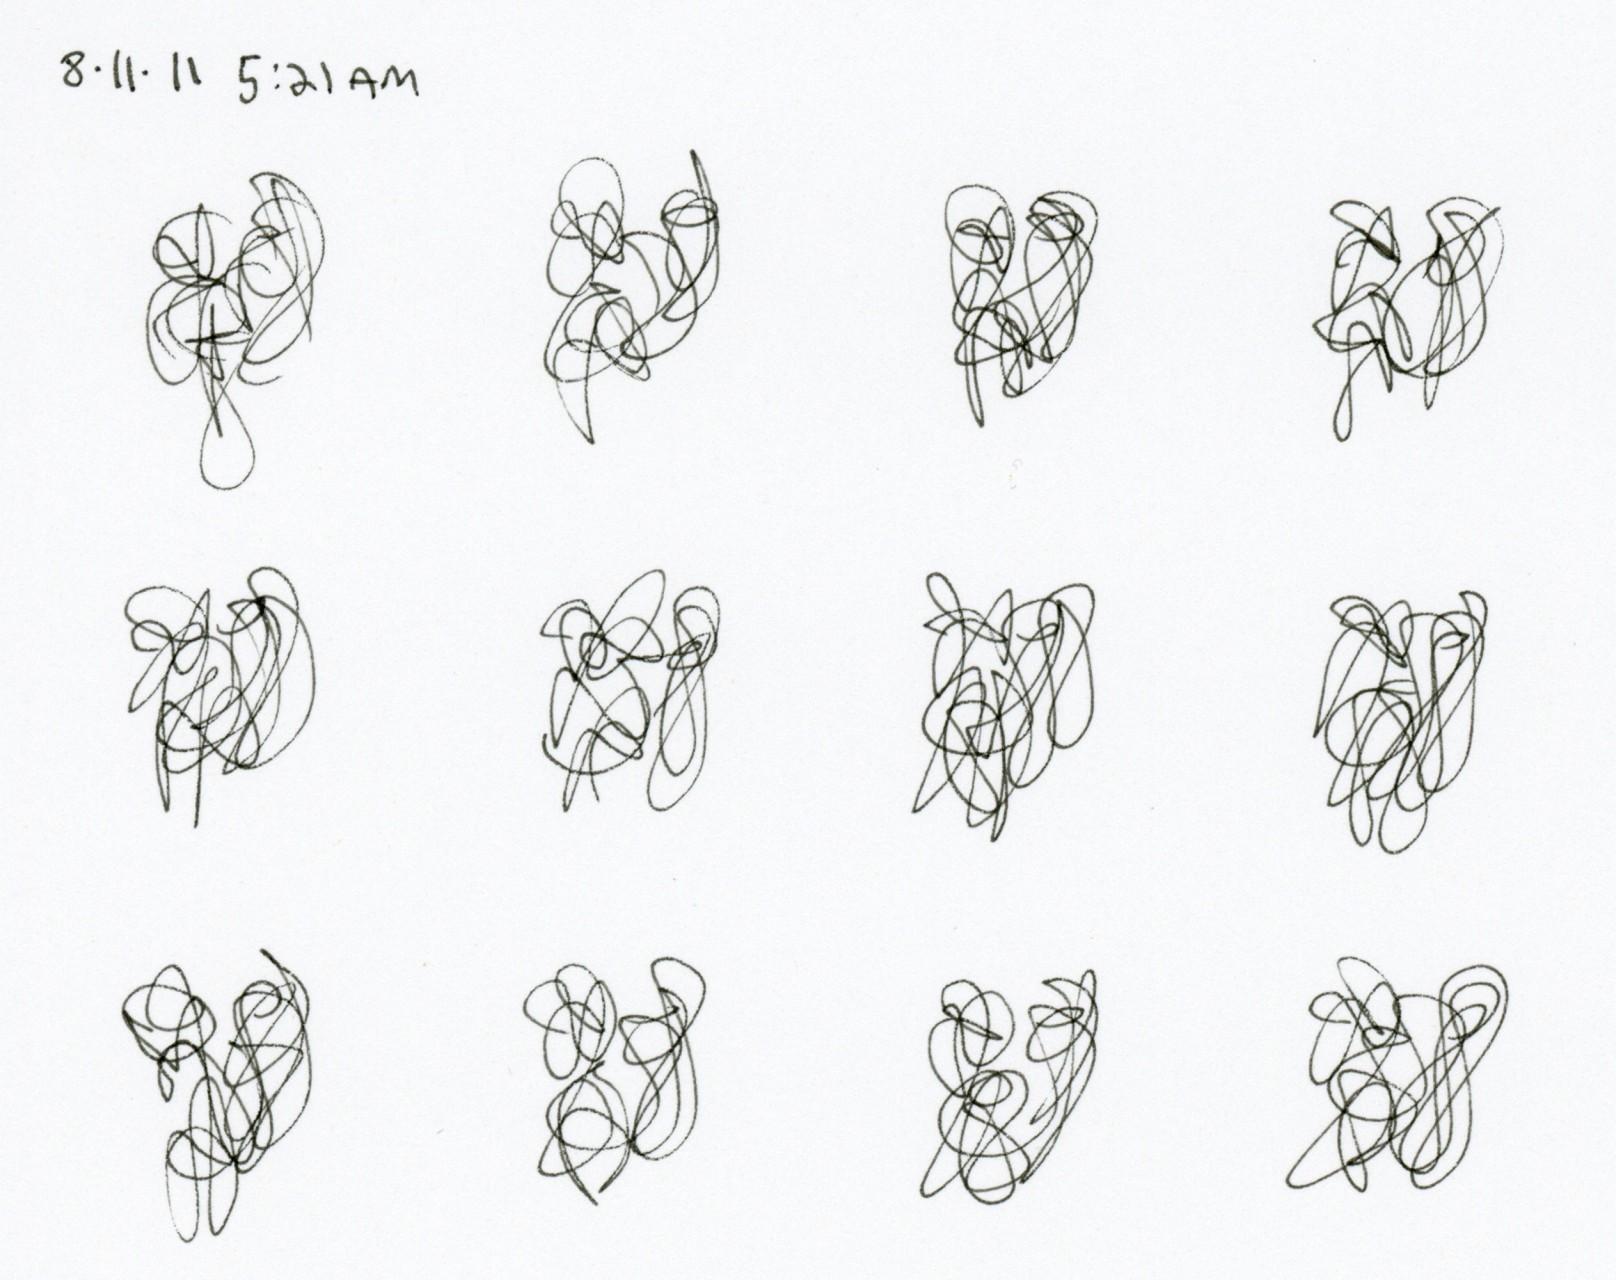 2011-08-11_05-21am-001